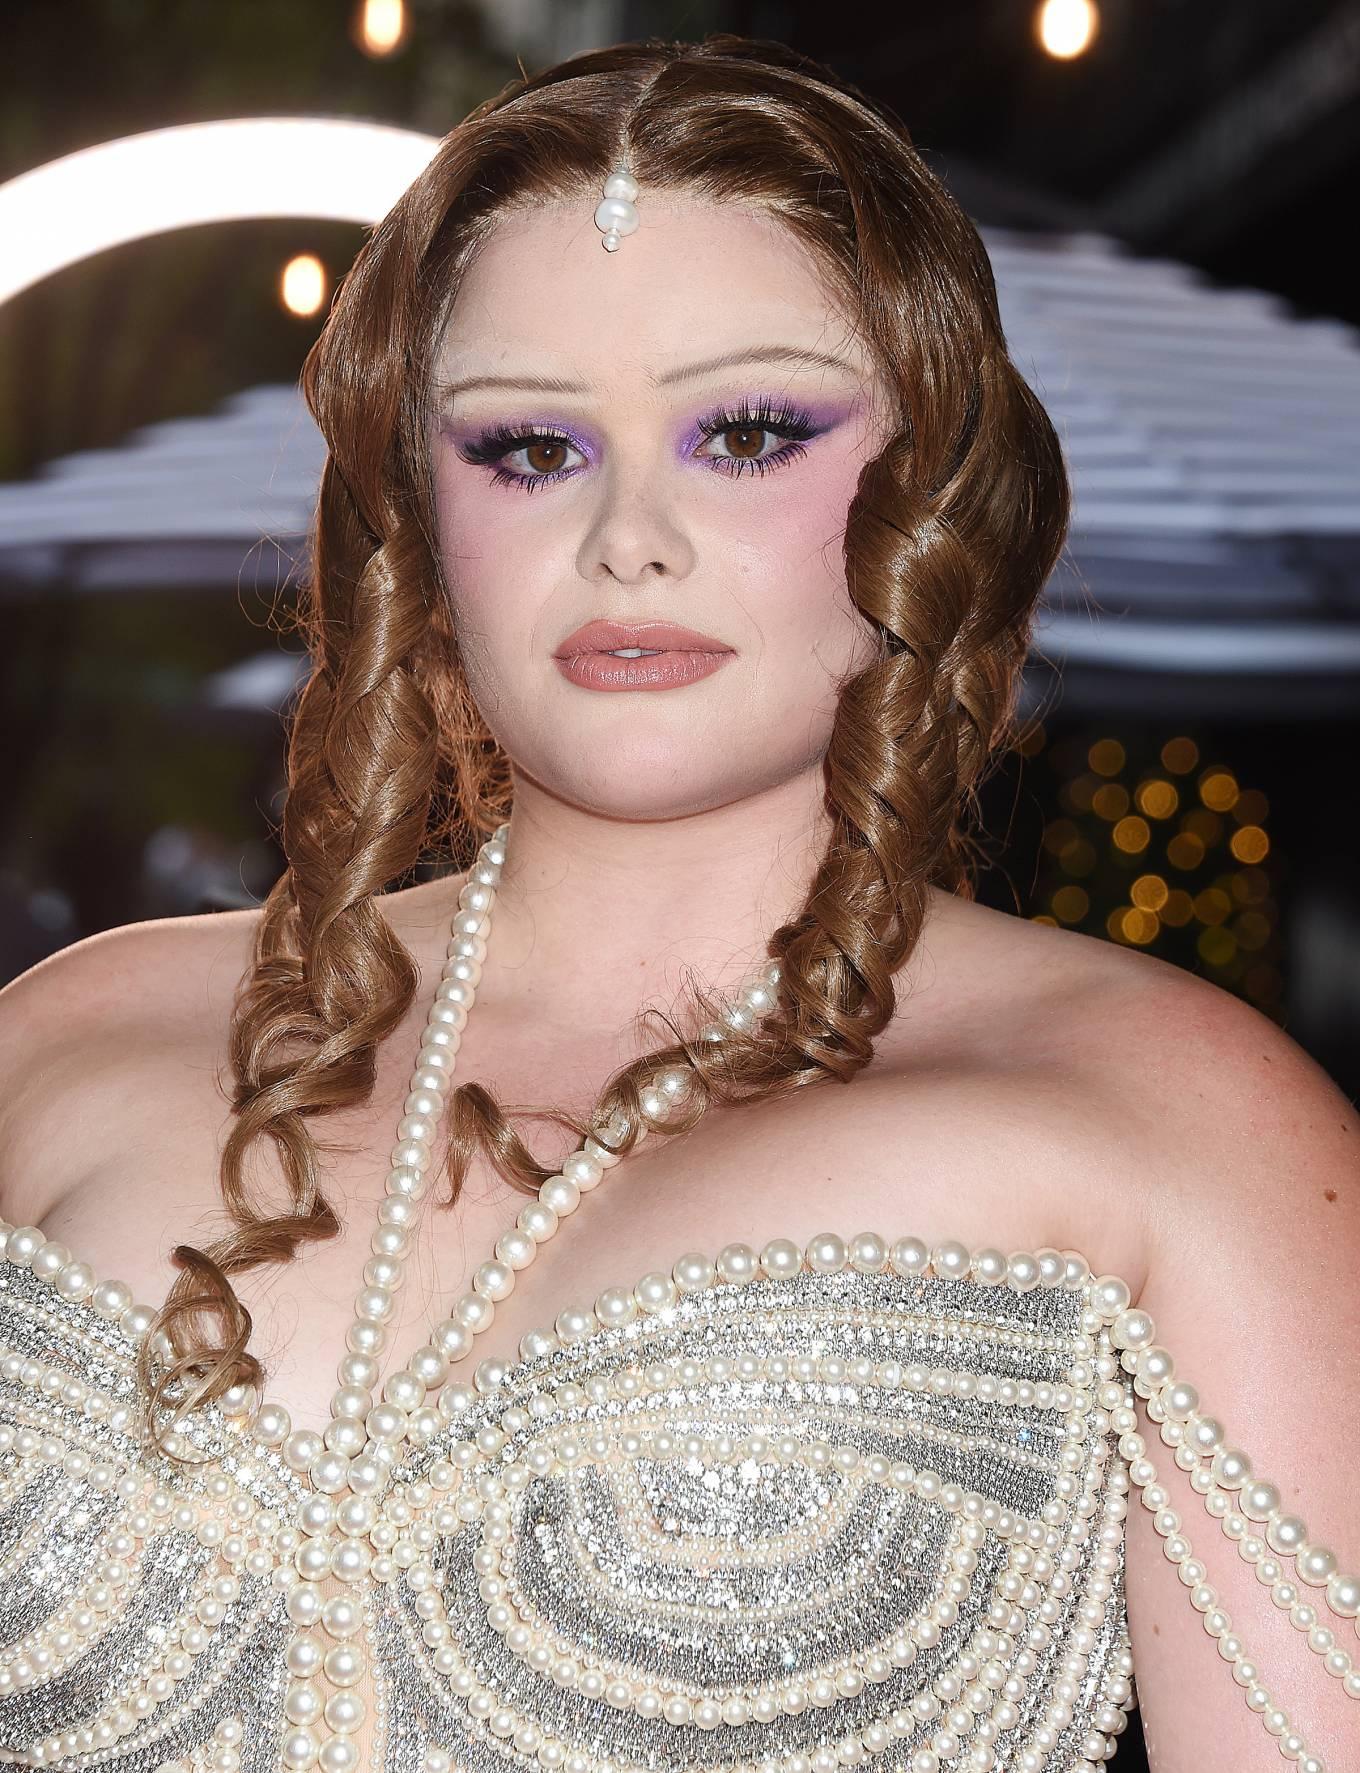 Barbie Ferreira 2021 : Barbie Ferreira – Seen departing The Mark Hotel in New York City for the 2021 Met Gala-05